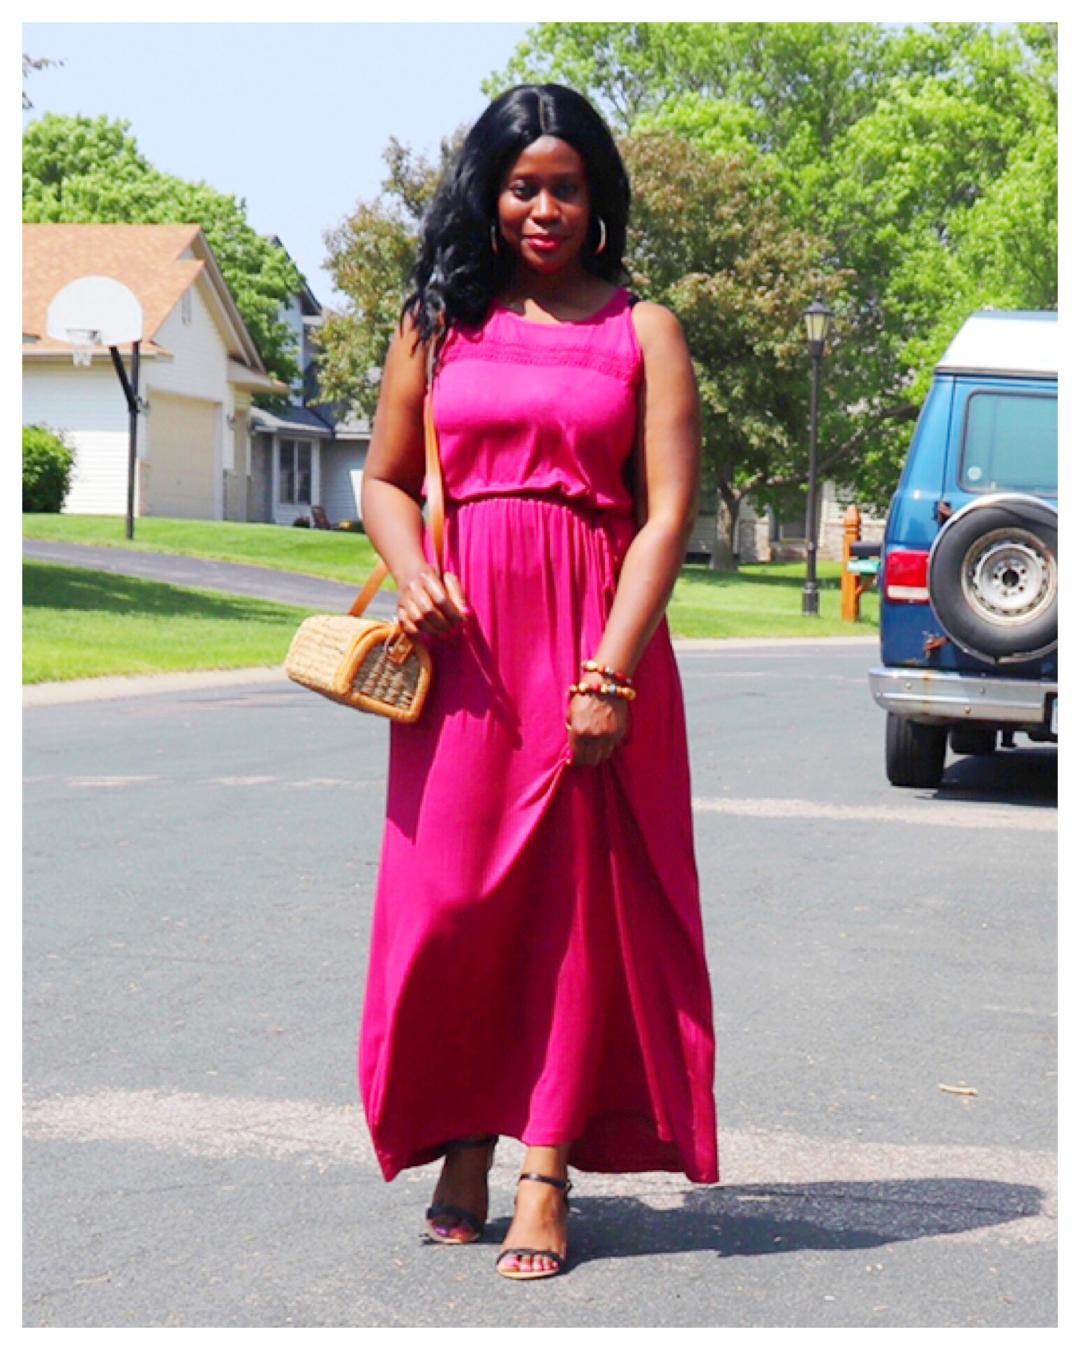 Fashion Beauty Zone: Beauty's Fashion Zone: Styling A Knit Dress All Through Summer